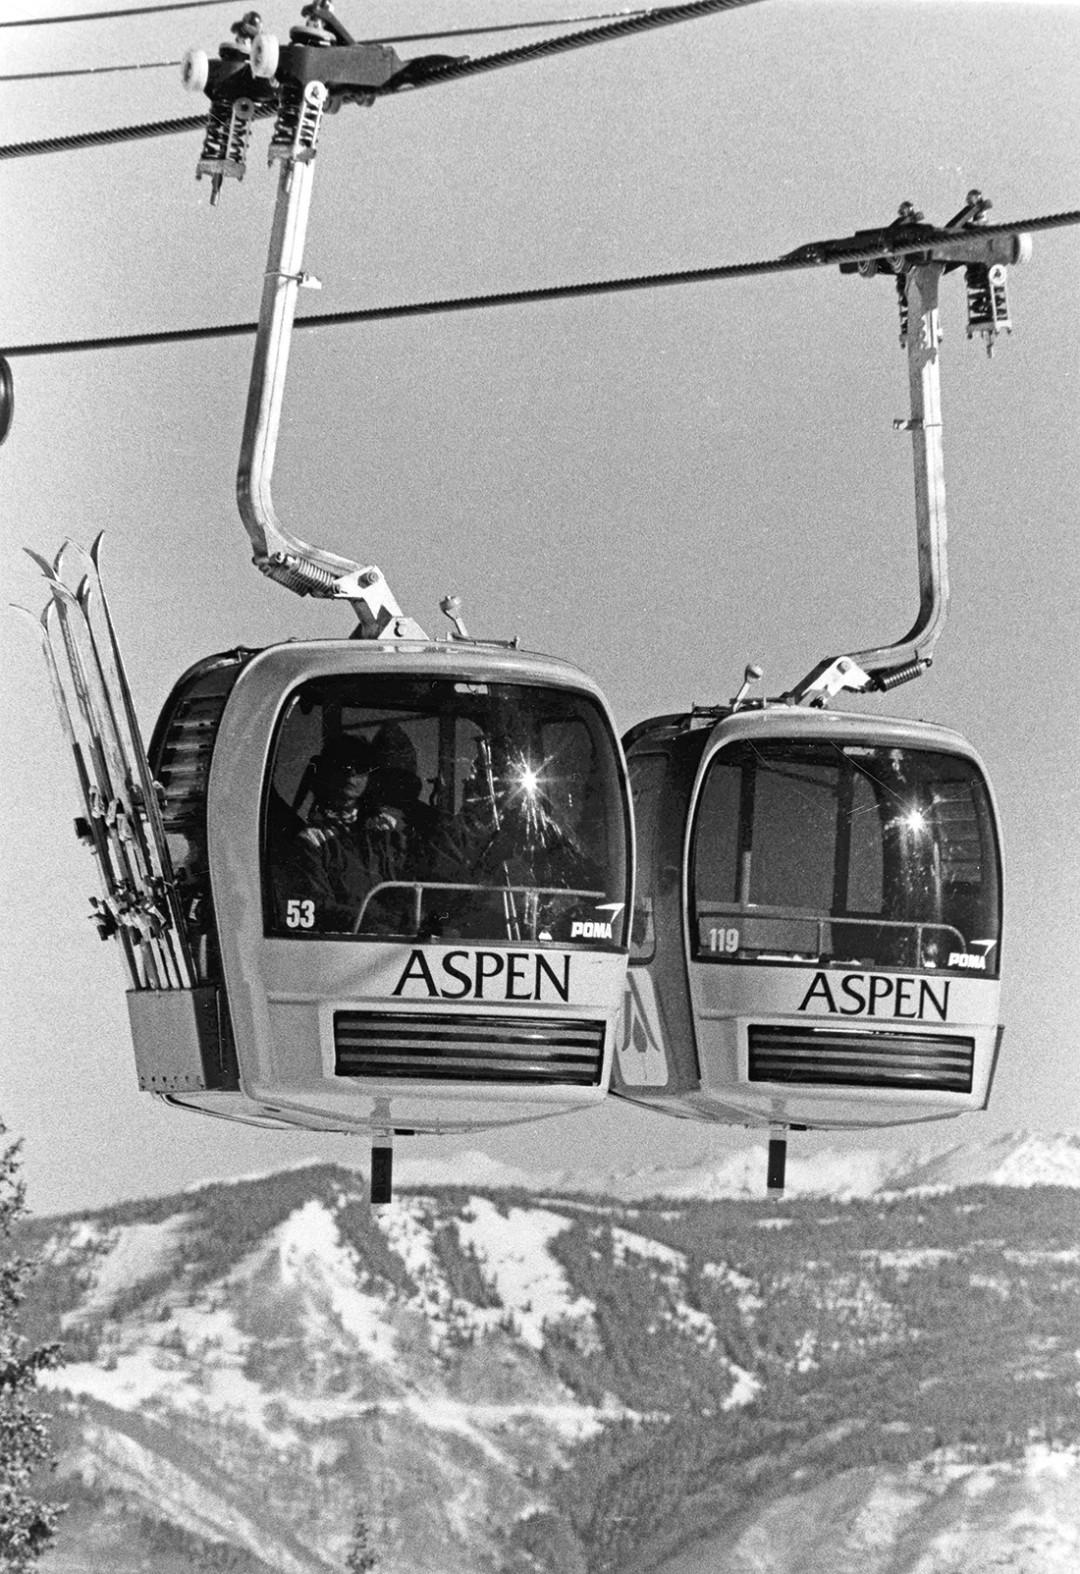 0215 breaking trail ski lift cabins ymaitk